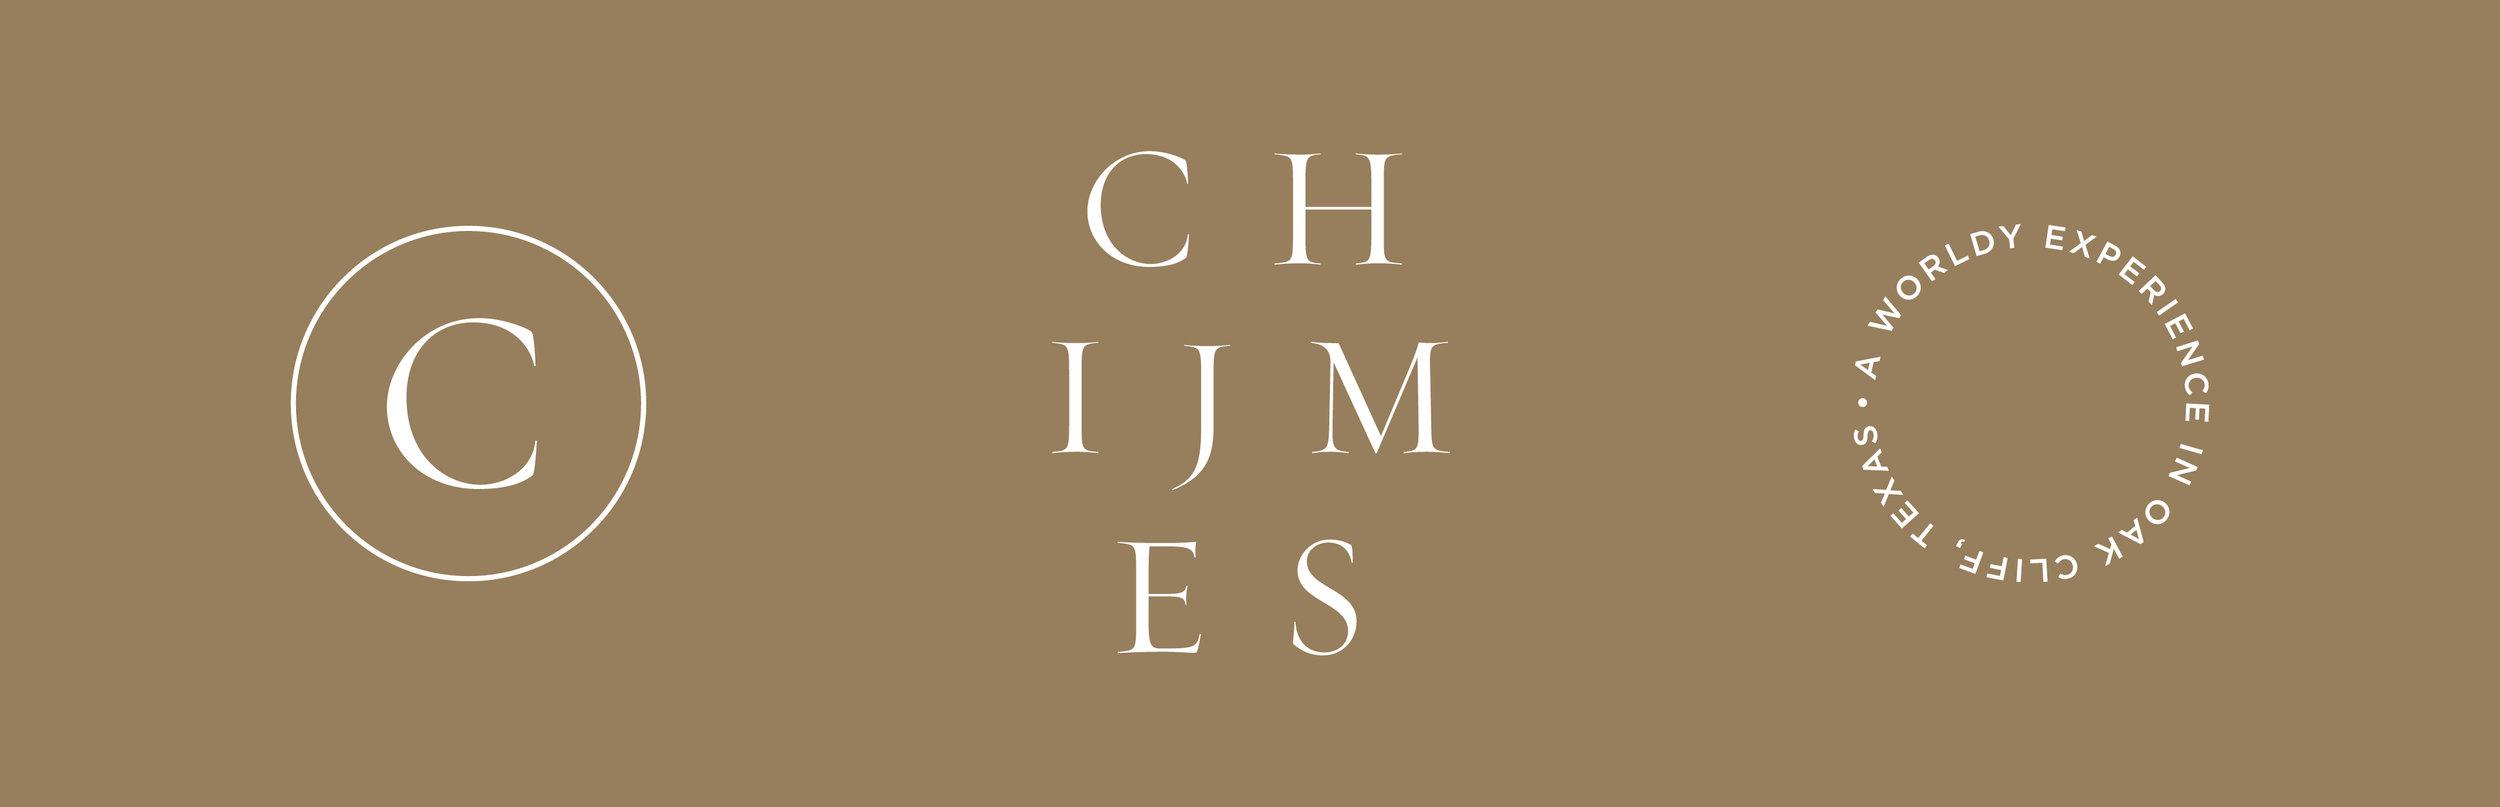 Chijmes-02.jpg